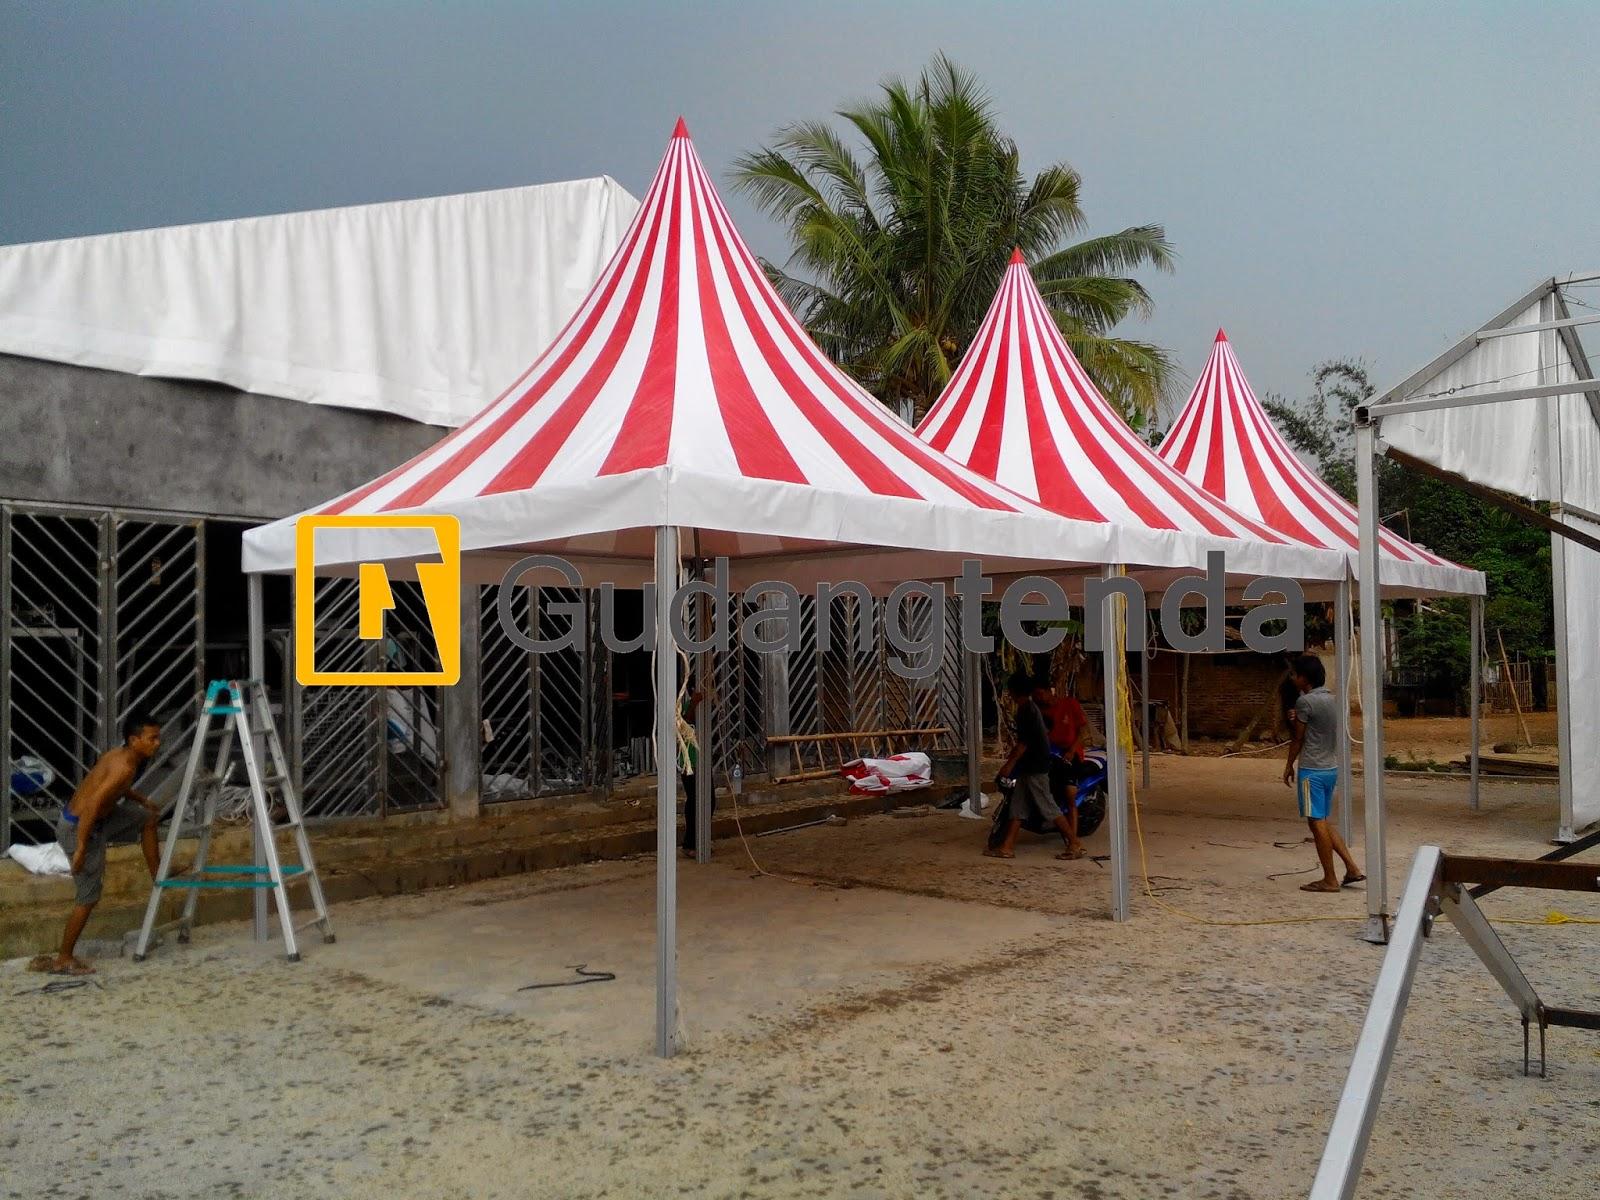 Pagoda Tent, Tenda Sirkus, Tenda sarnafil, Tenda sarnafil sirkus